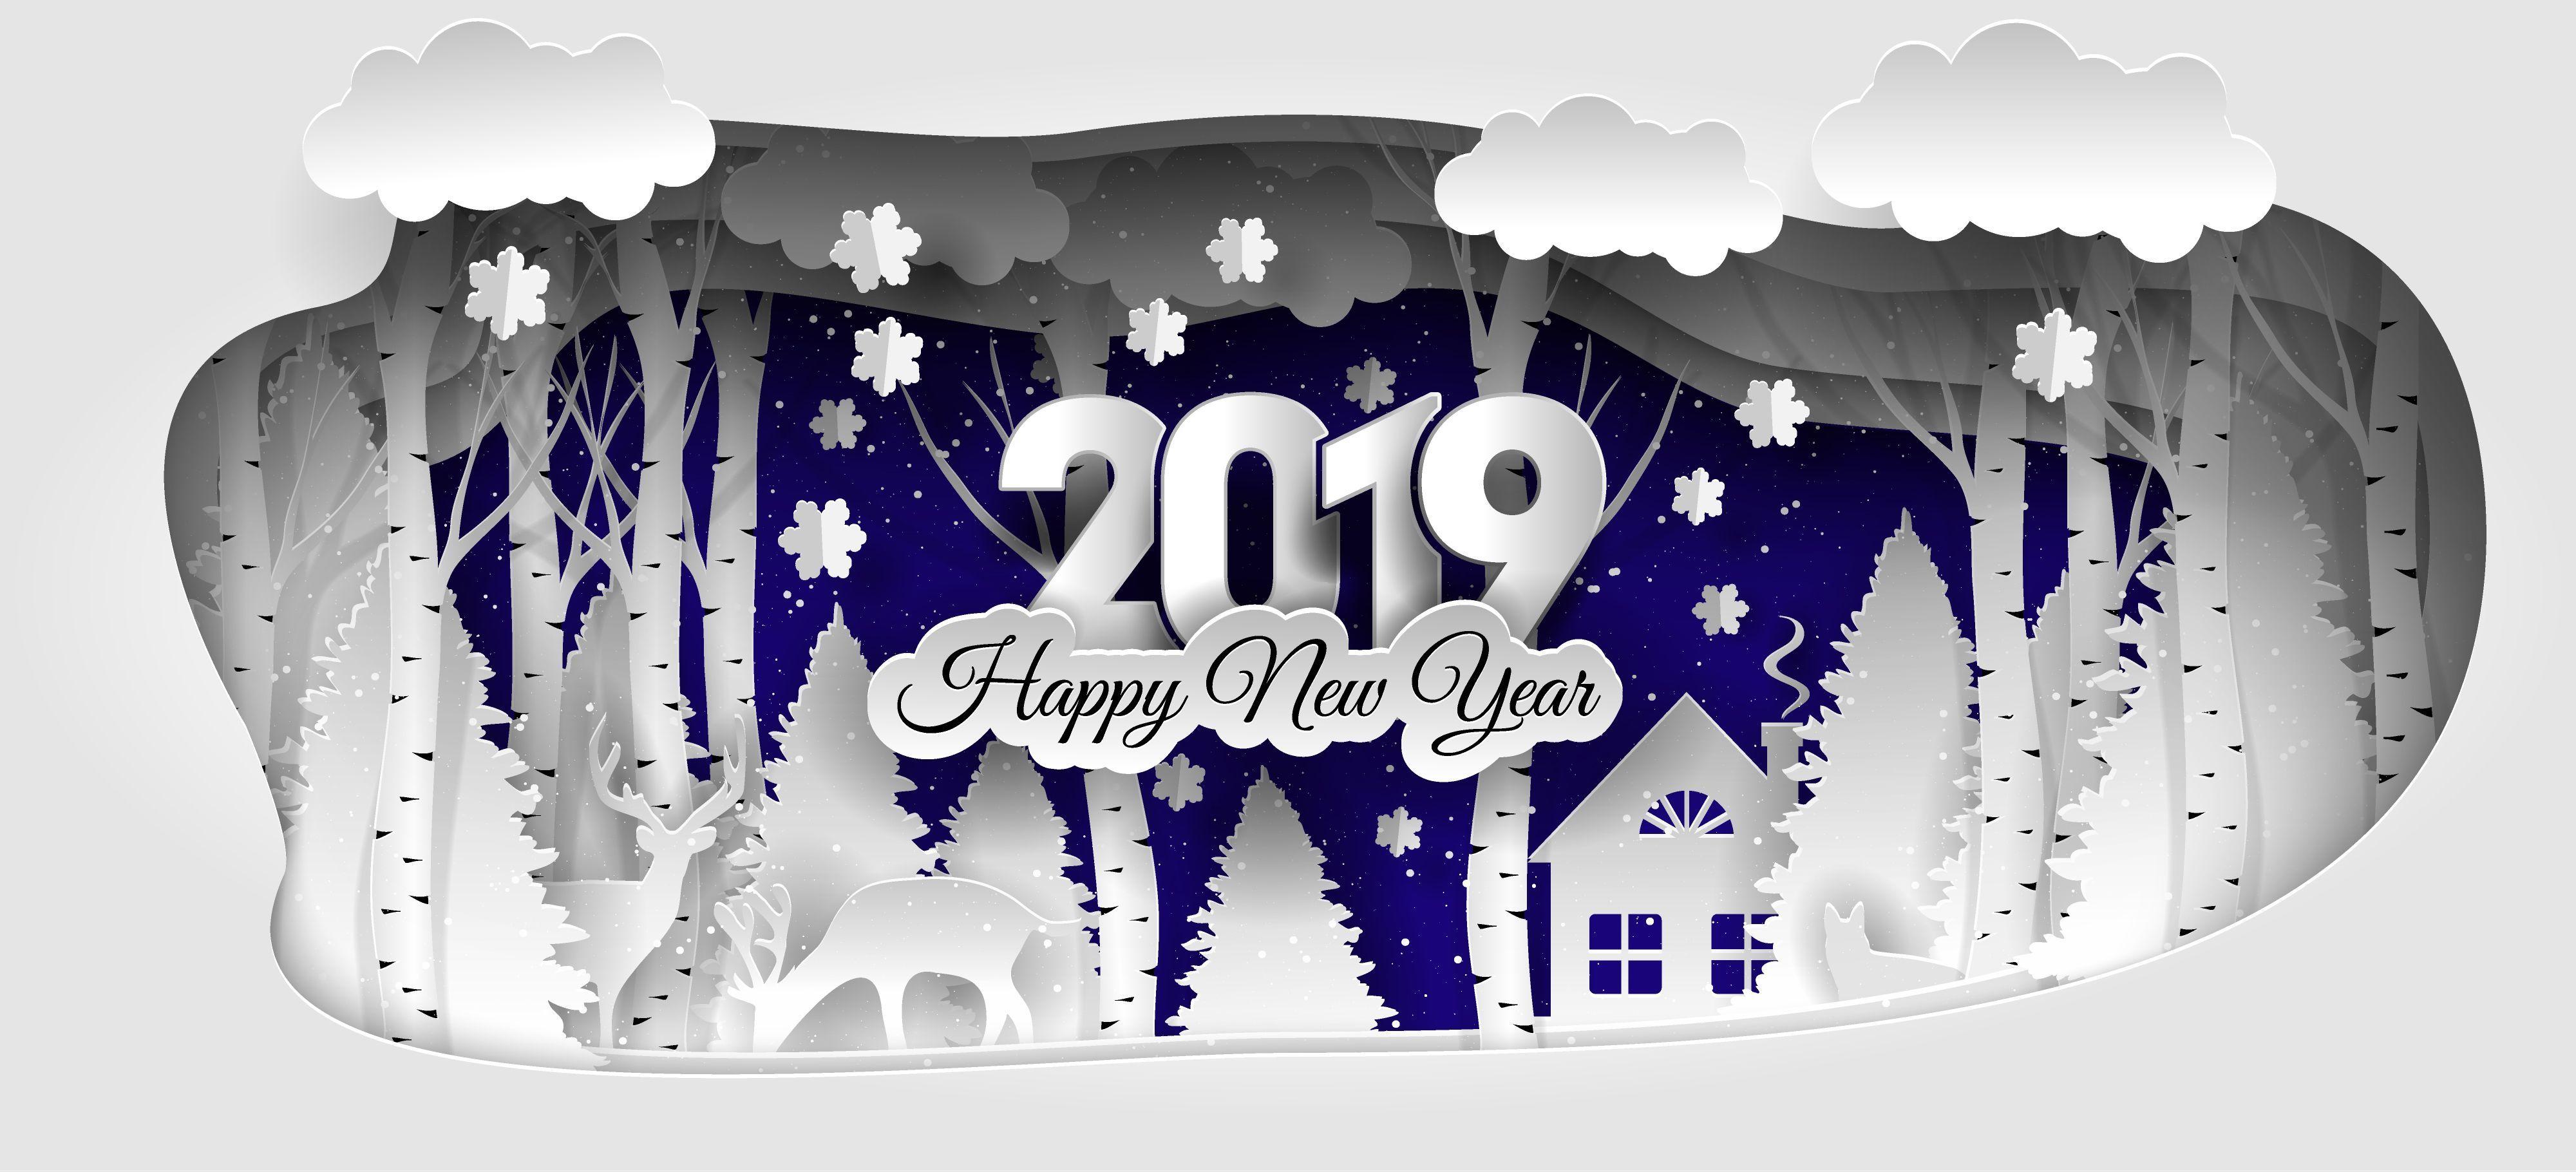 Happy New Year ) Happy merry christmas, Happy new year